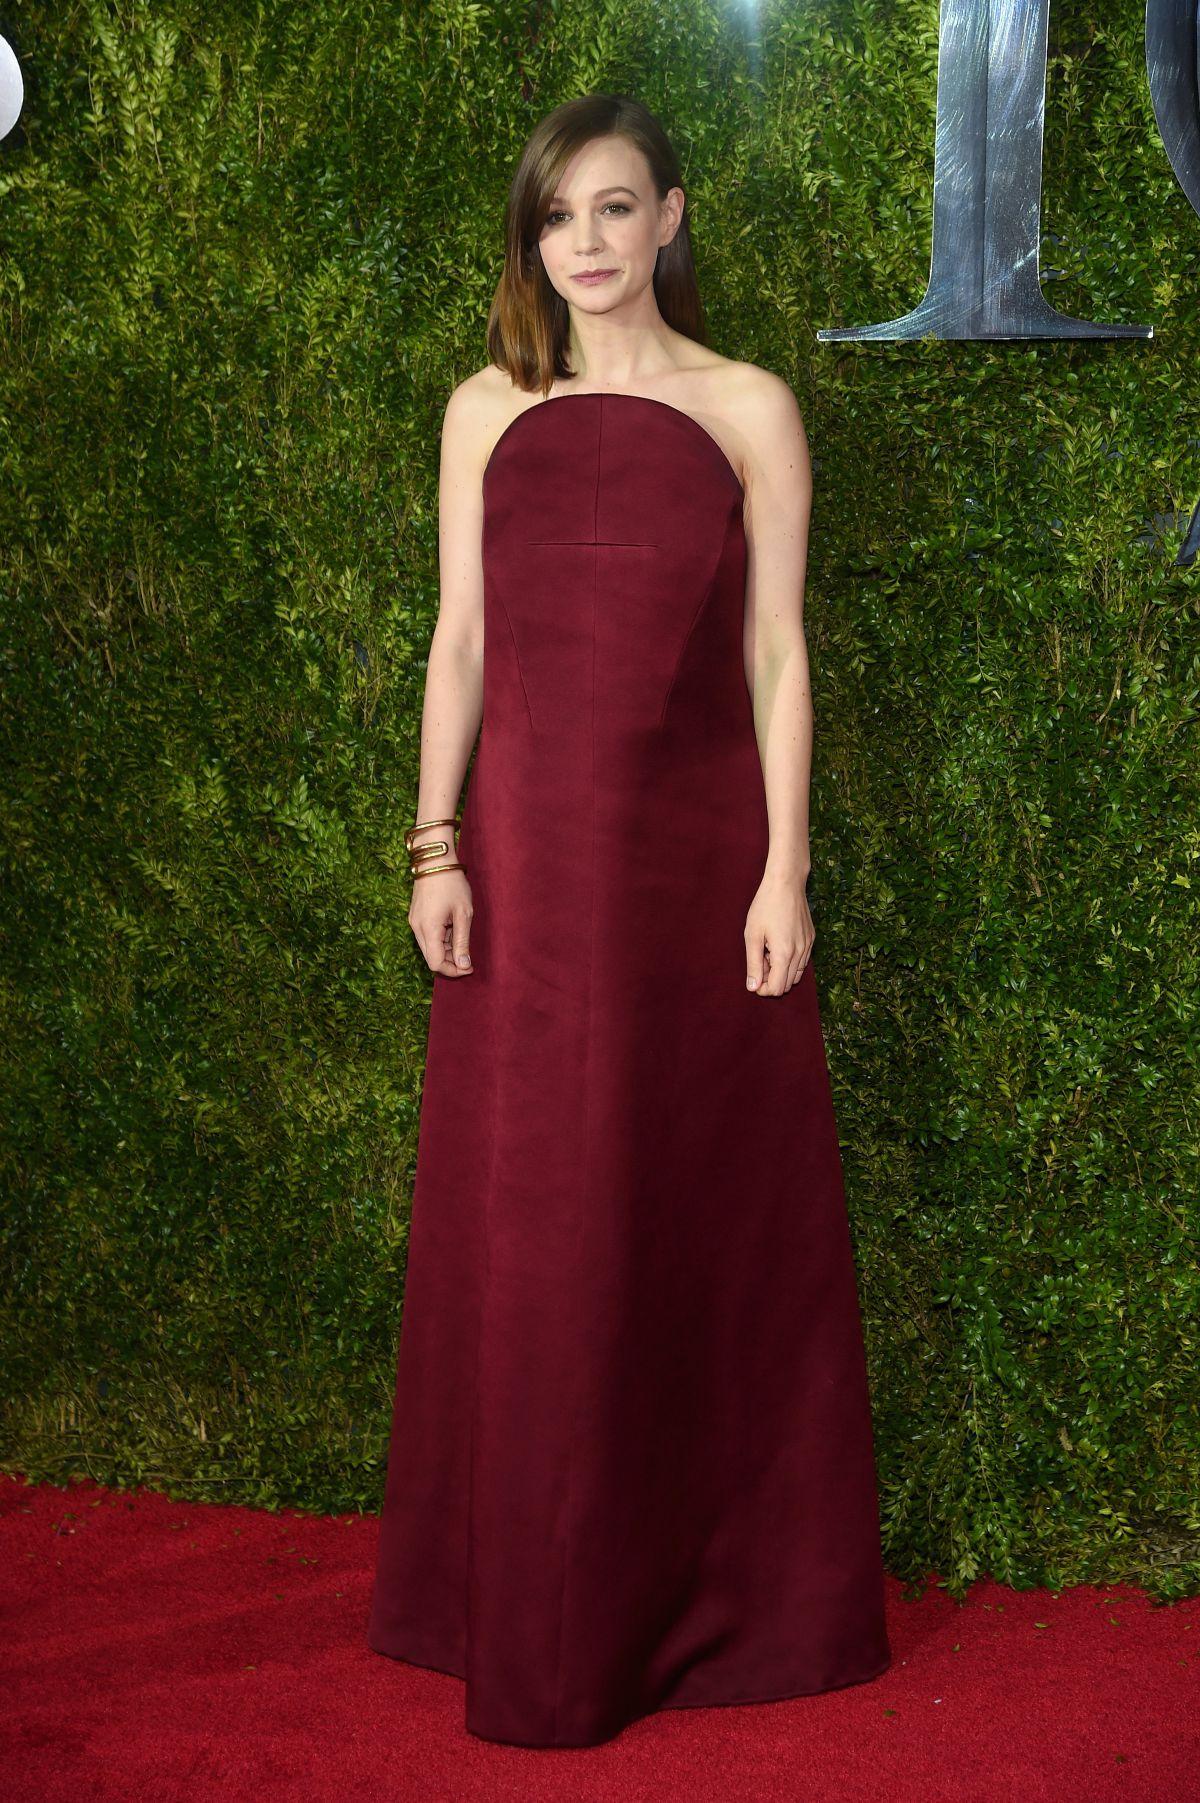 CAREY MULLIGAN at 2015 Tony Awards in New York